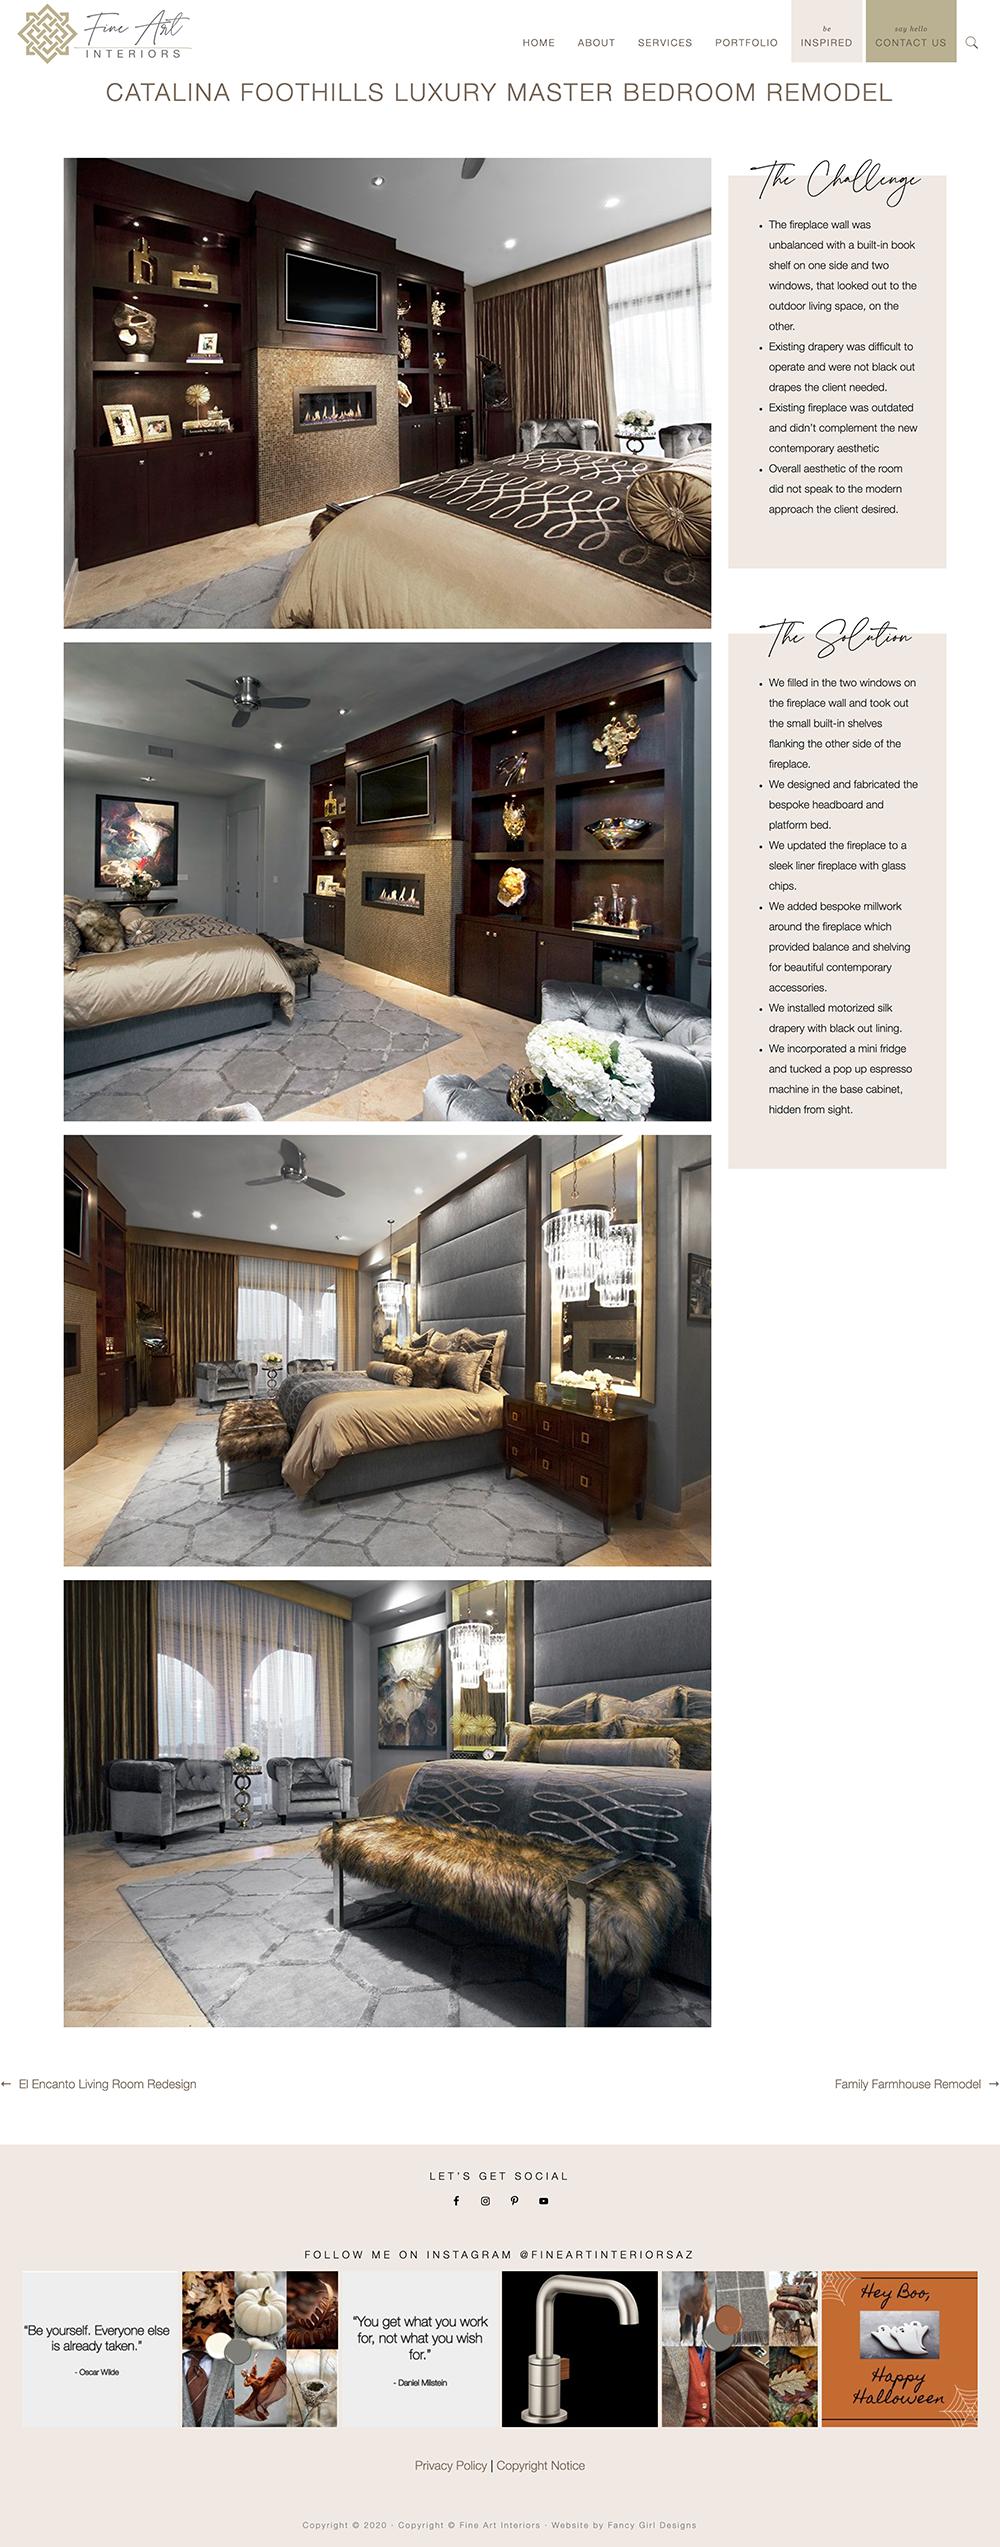 portfolio page sample, from Fine Art Interiors